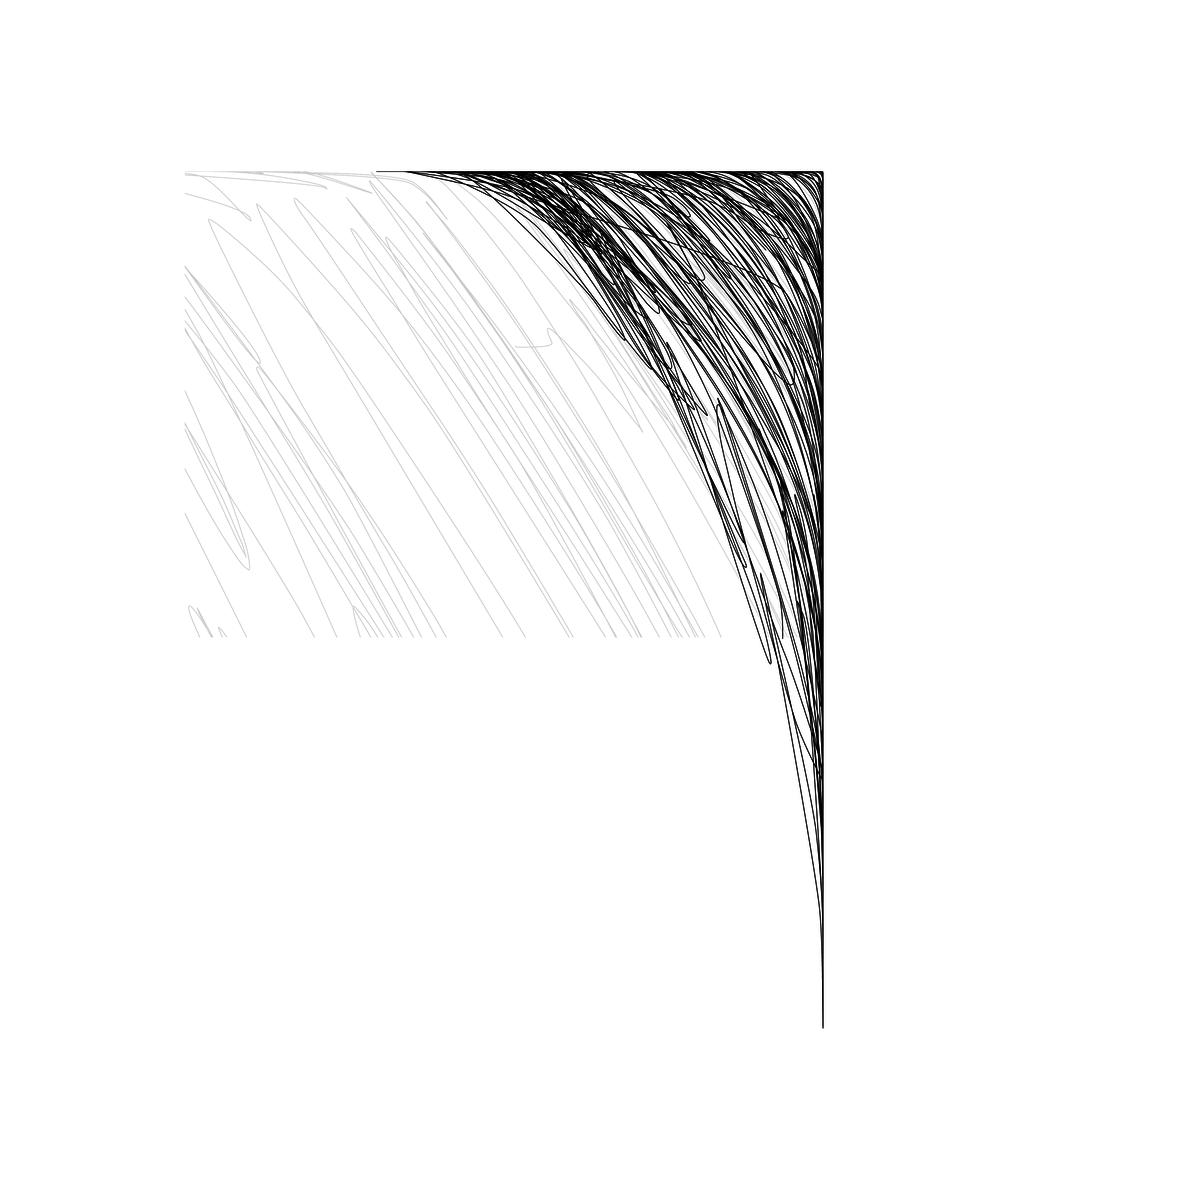 BAAAM drawing#16494 lat:52.4756202697753900lng: 13.4041604995727540